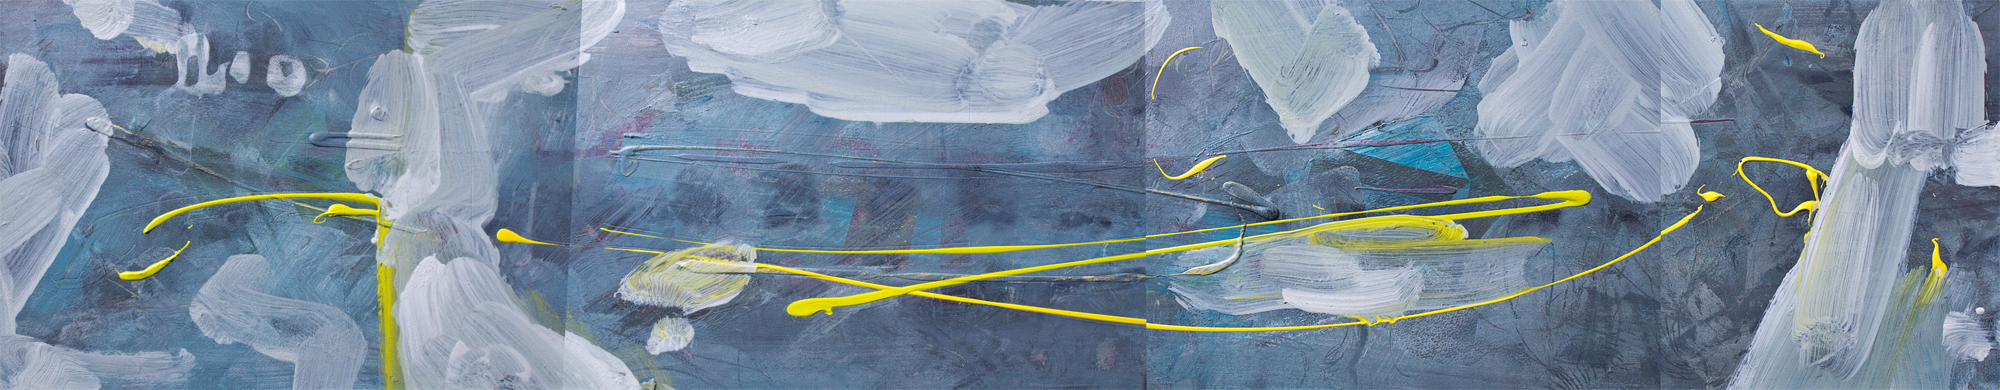 Four segments of blues © Prosper Jerominus, 2015